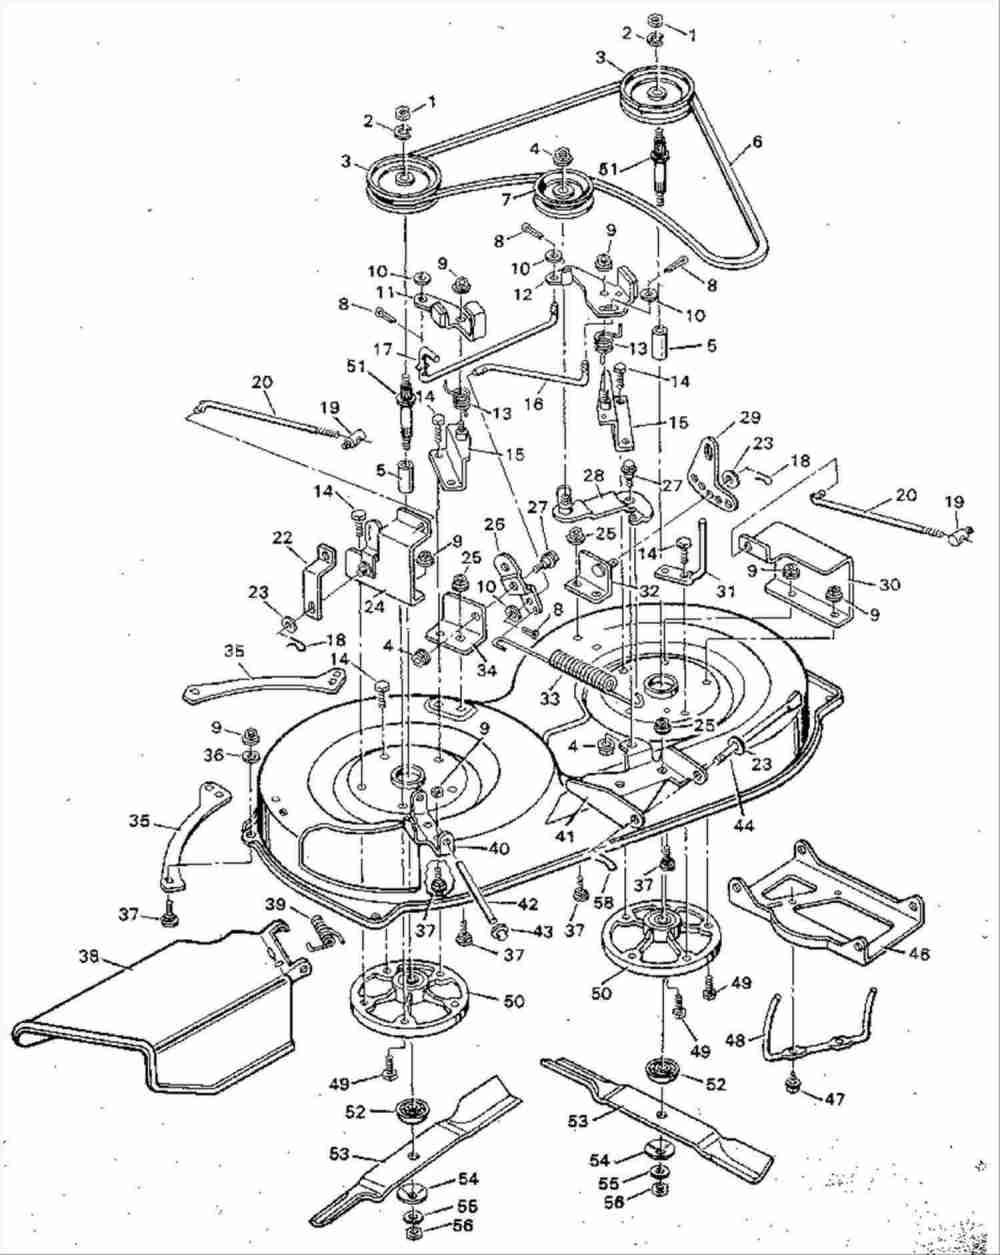 medium resolution of 1500x1883 craftsman lawn mower engine parts diagram lawn mower drawing